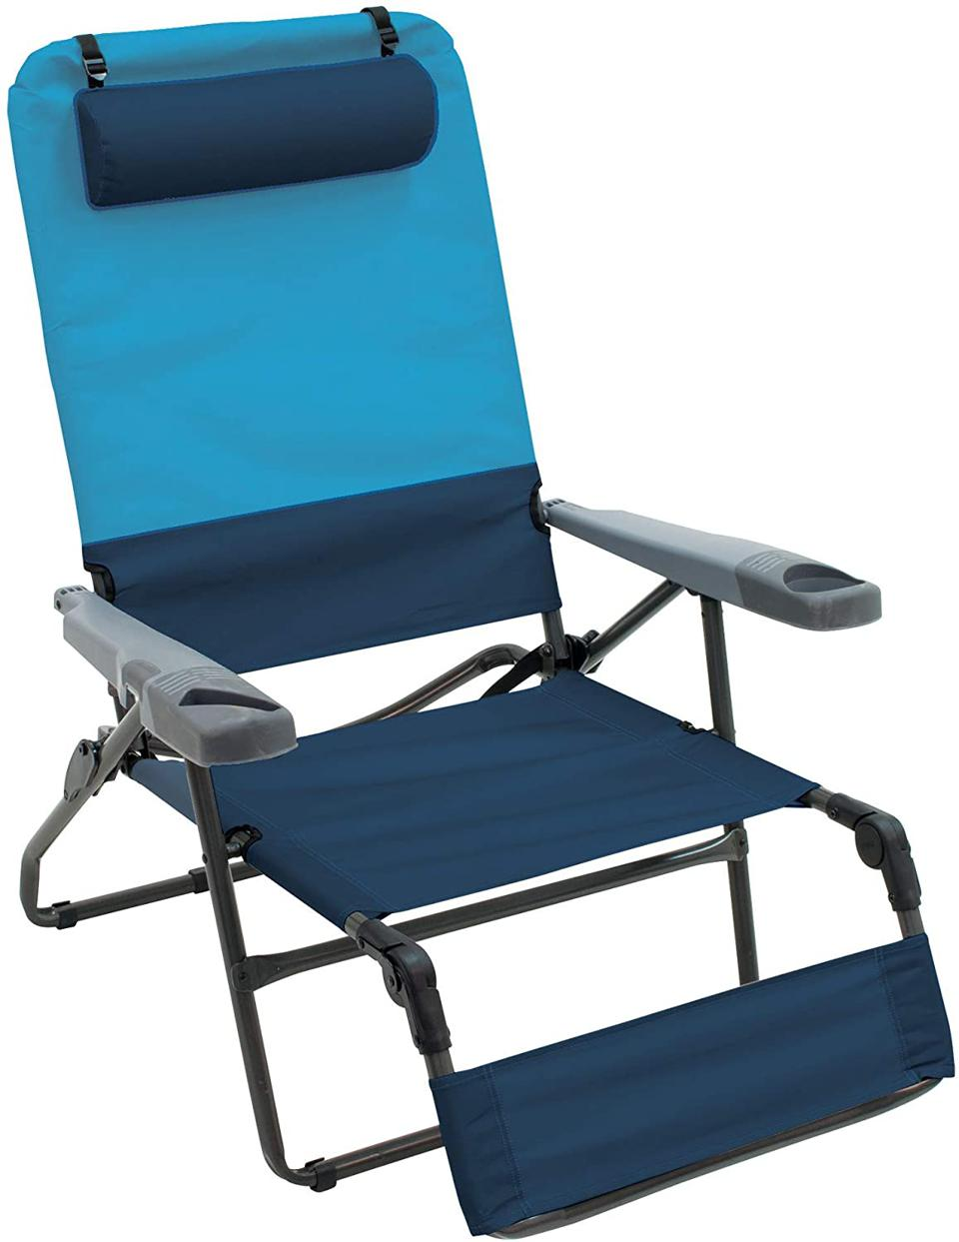 Rio Gear 4-Position Ottoman Lounge Chair